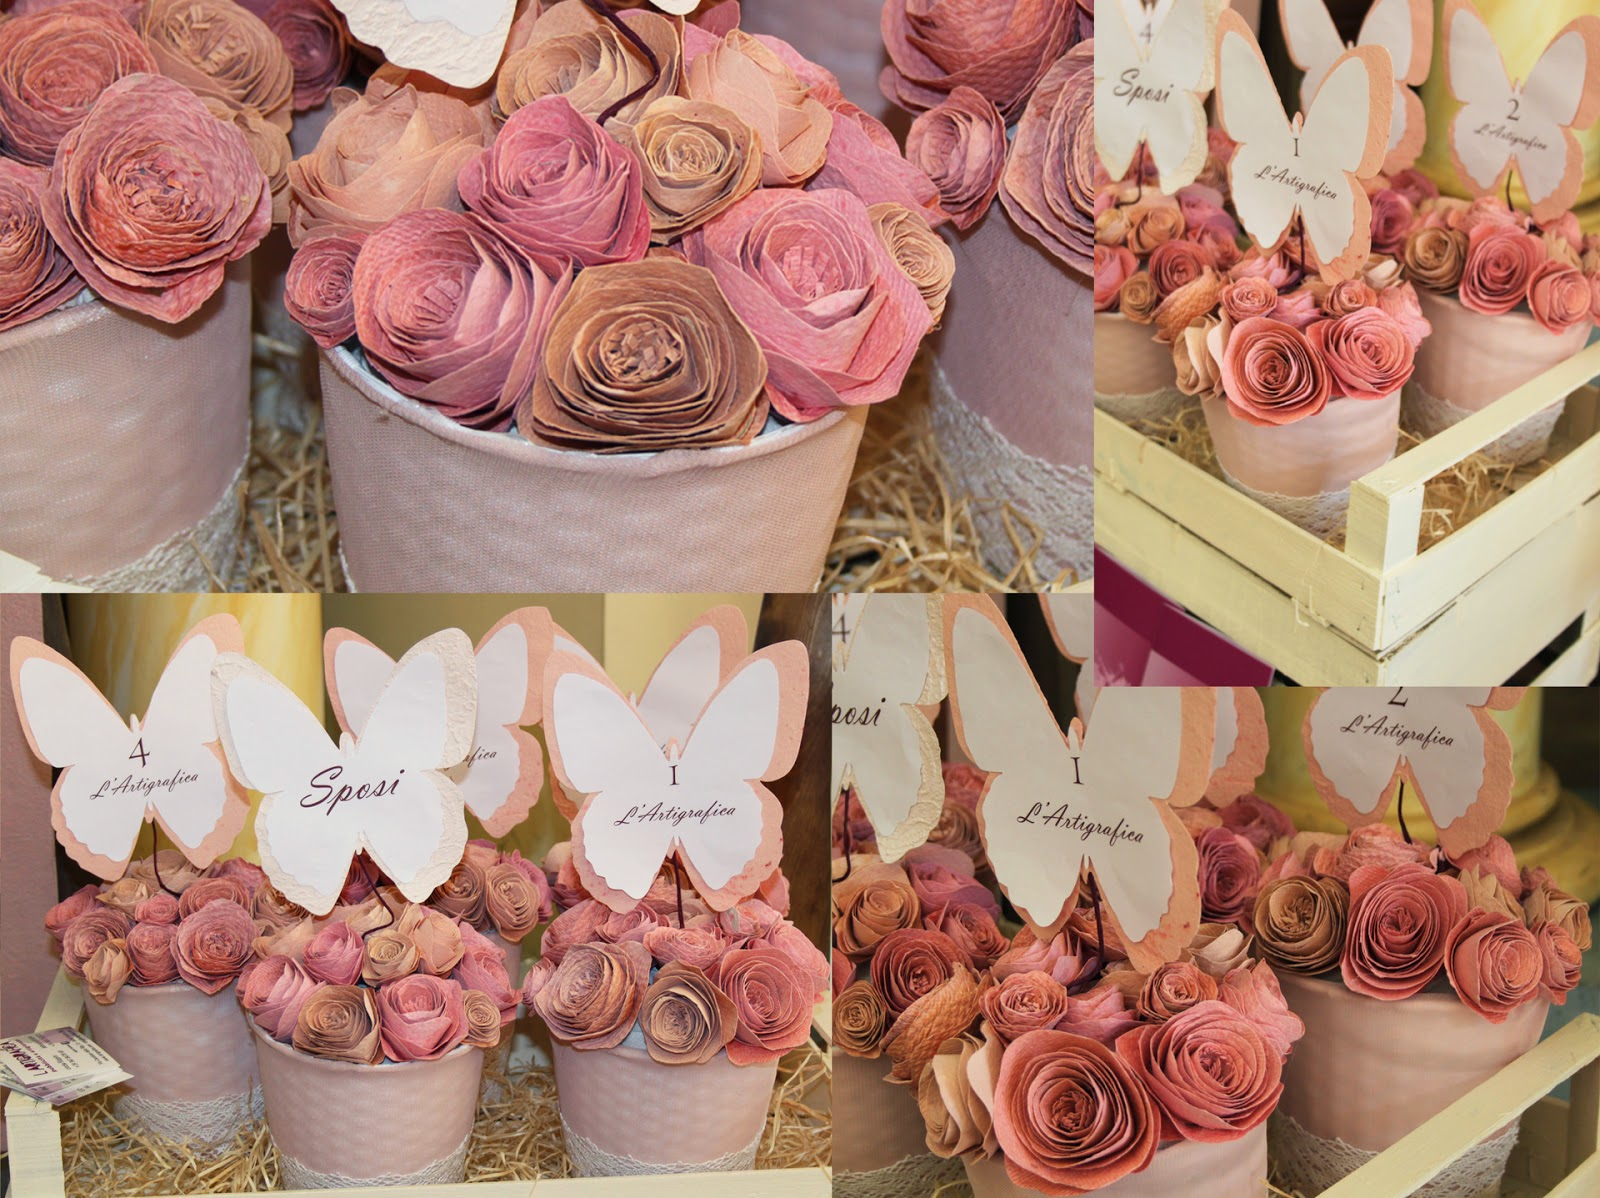 Centrotavola Matrimonio Tema Dolci : Matrimonio azzurro polvere centrotavola con rose di carta